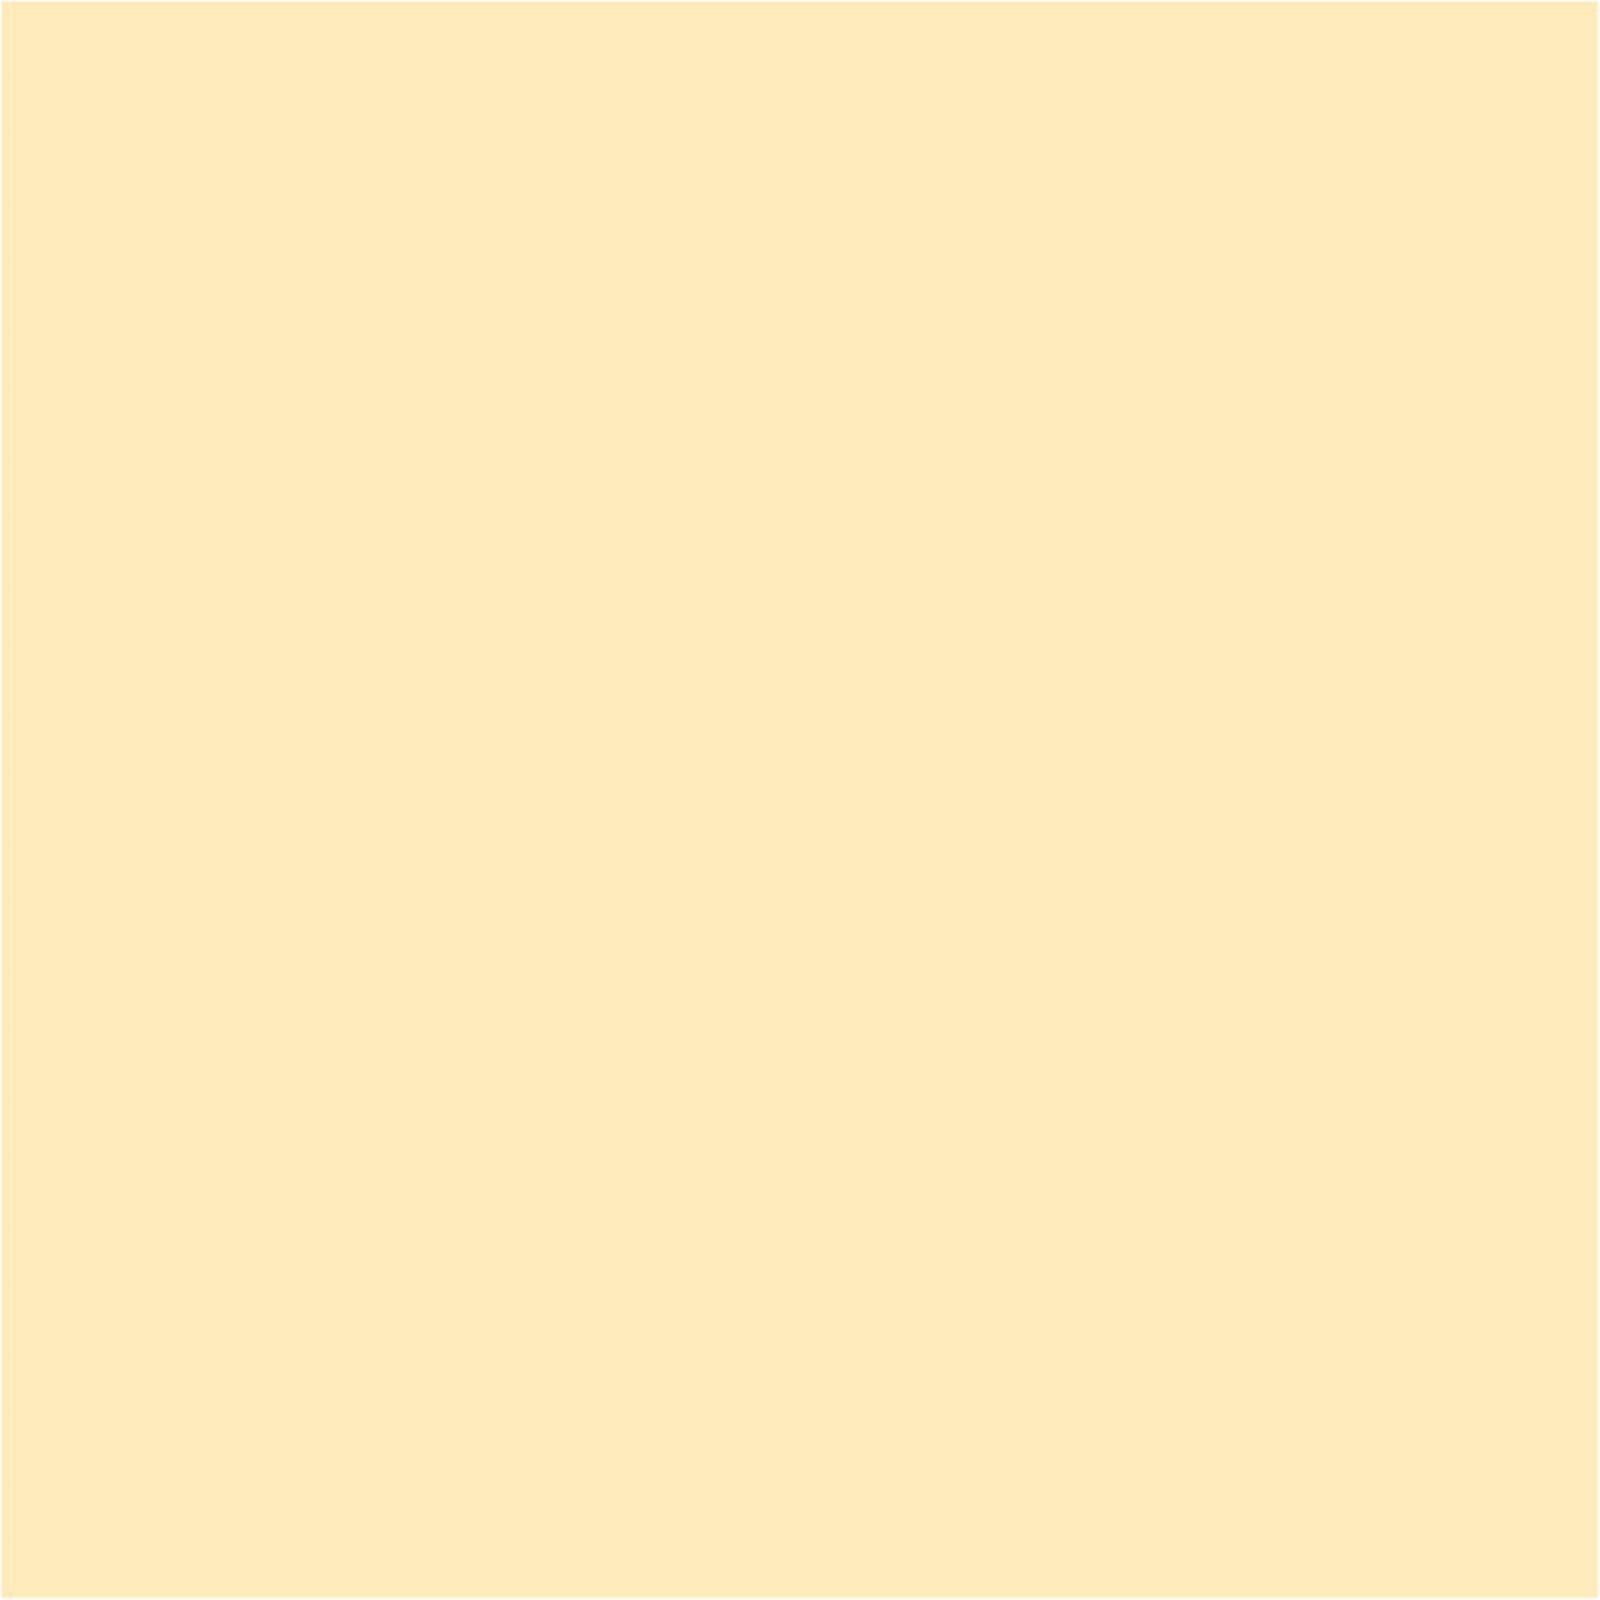 tan light